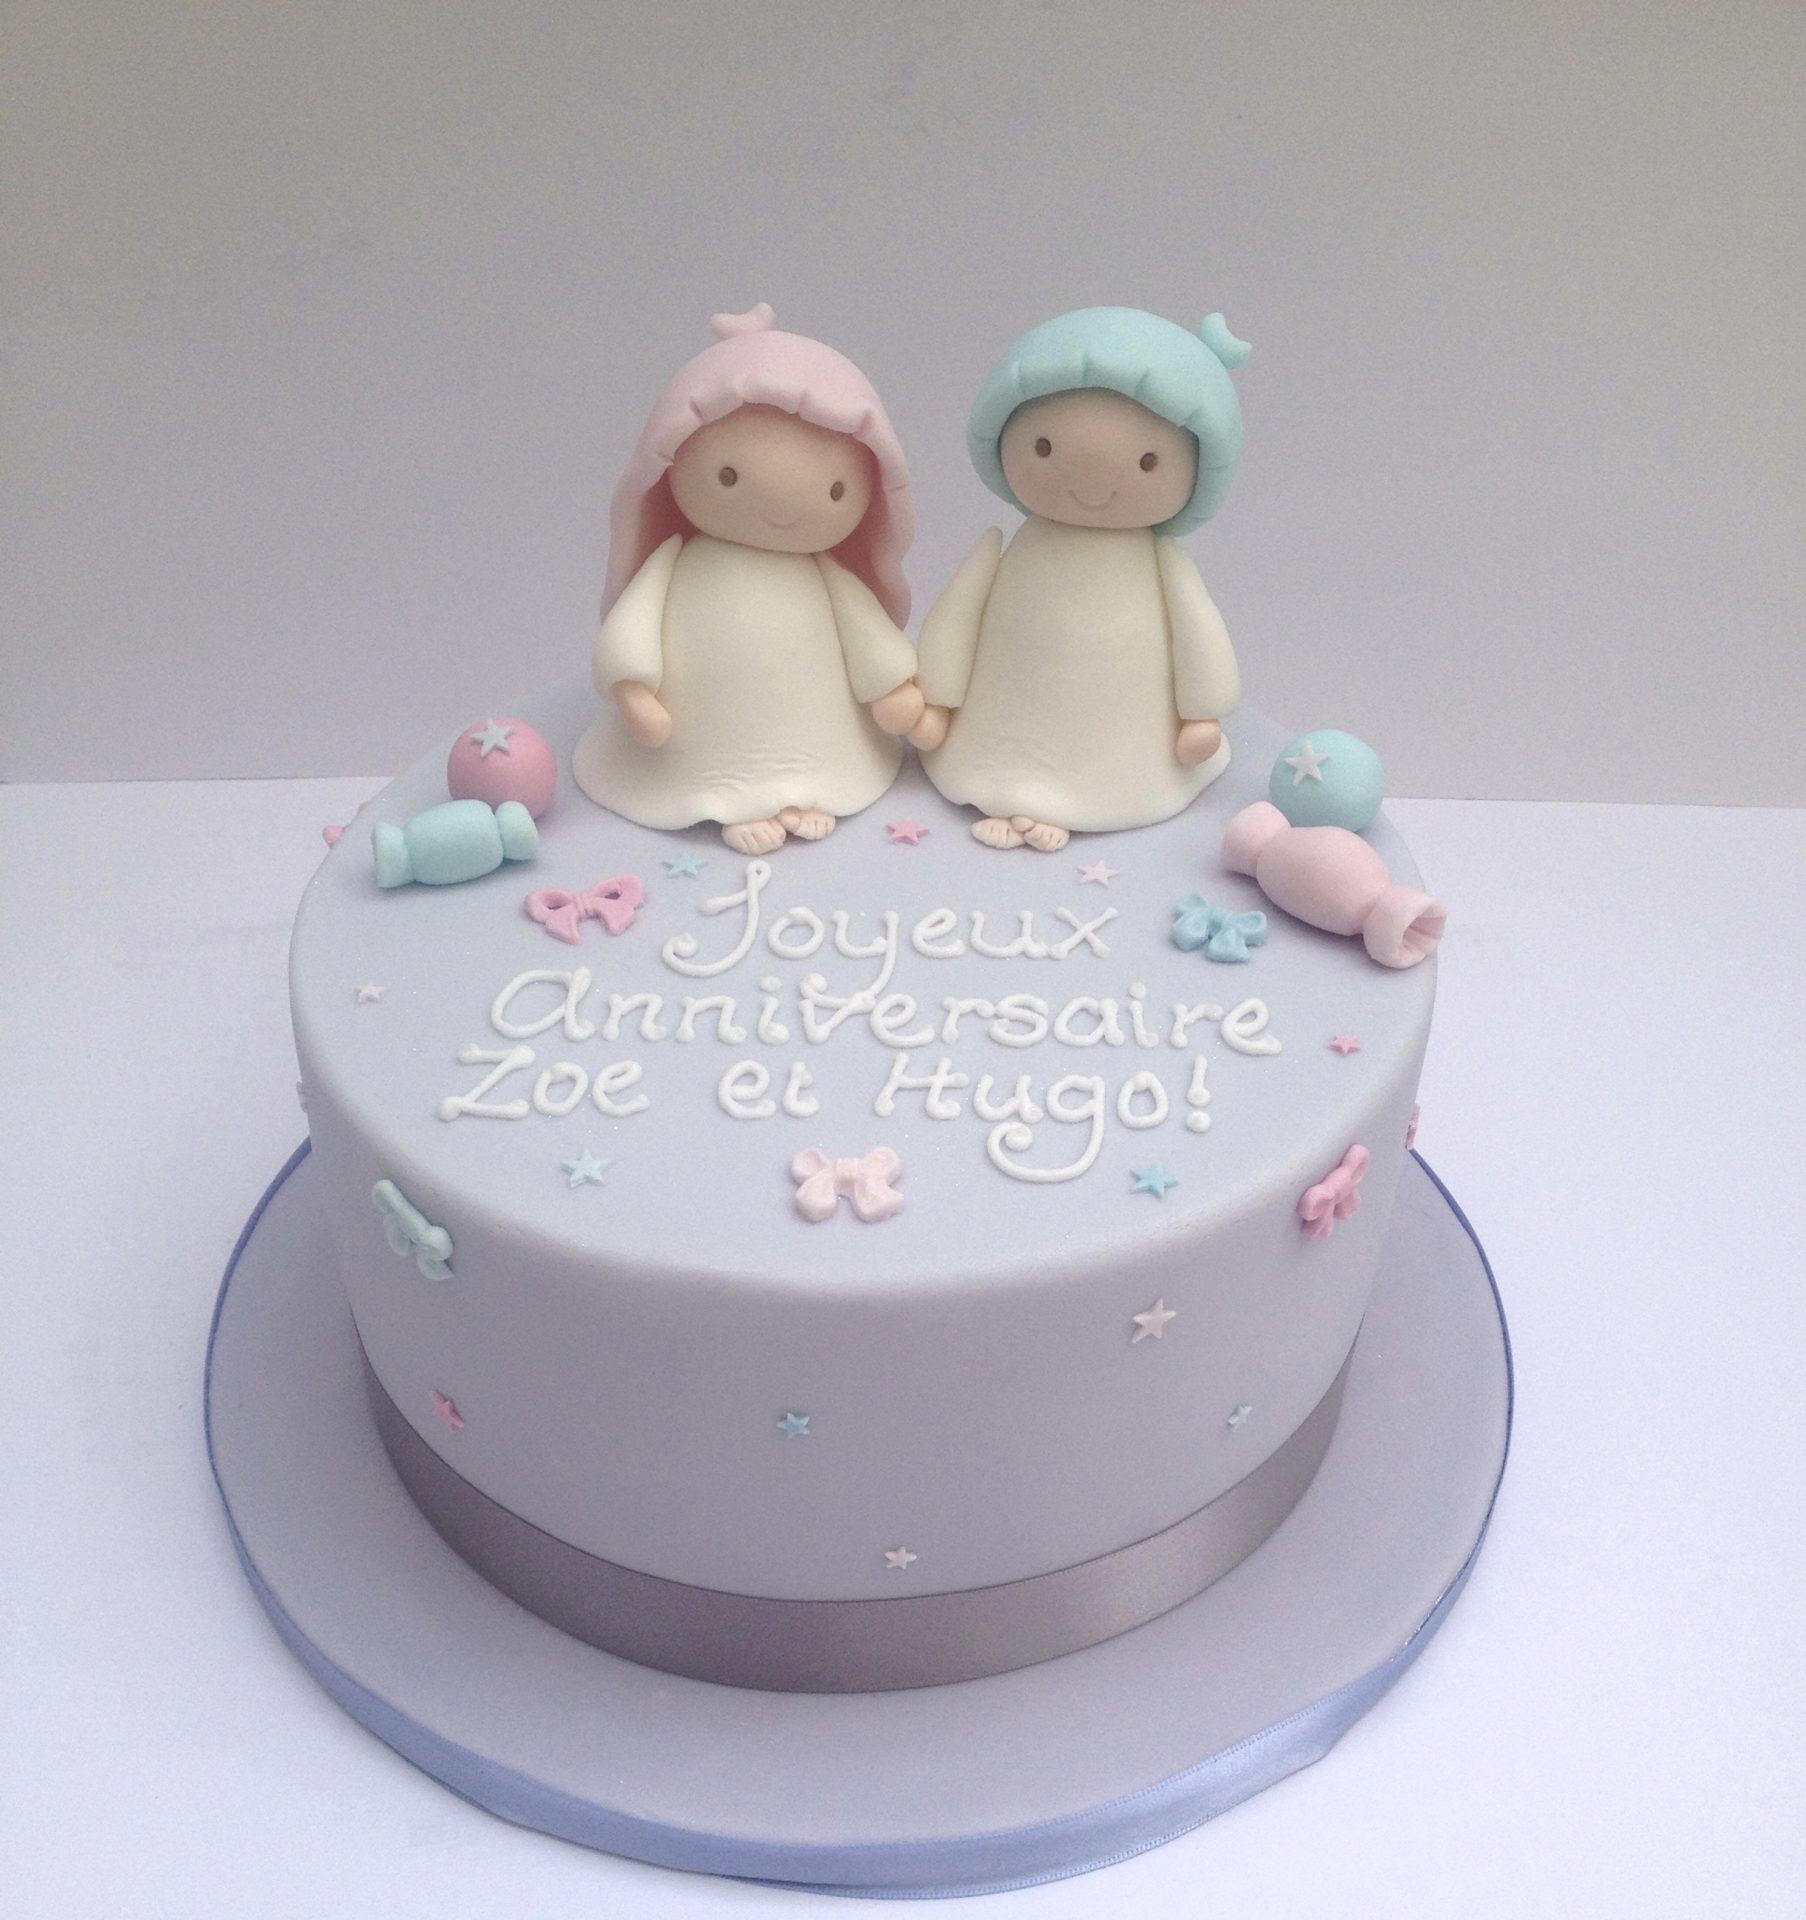 Fabulous Twins Birthday Cake Etoile Bakery Funny Birthday Cards Online Alyptdamsfinfo